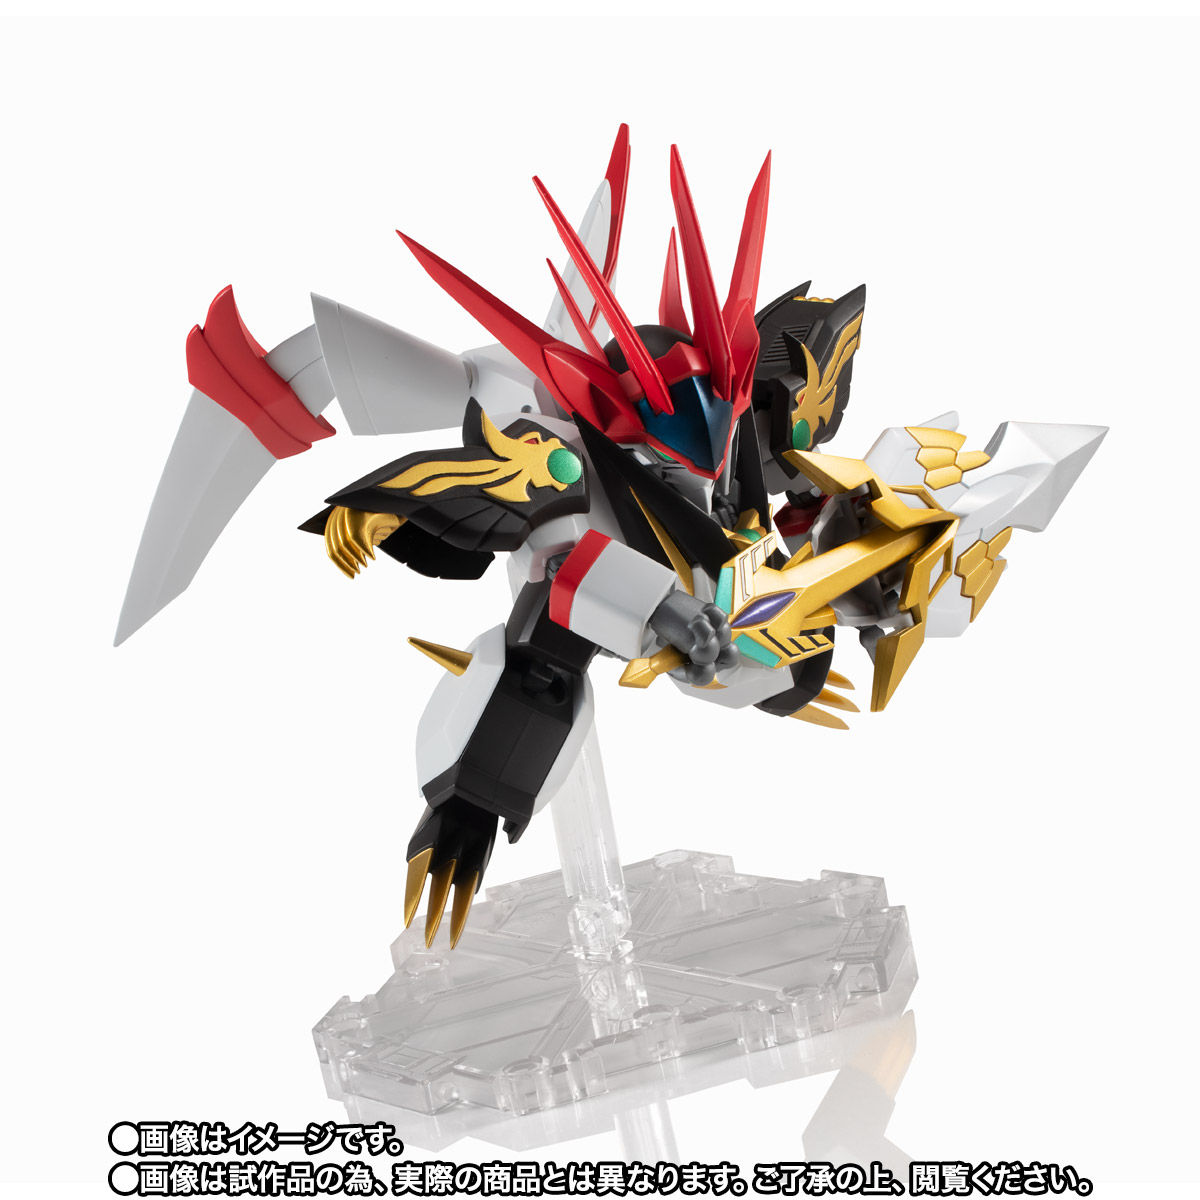 NXEDGE STYLE[MASHIN UNIT]『白虎丸』魔神英雄伝ワタル 可動フィギュア-002